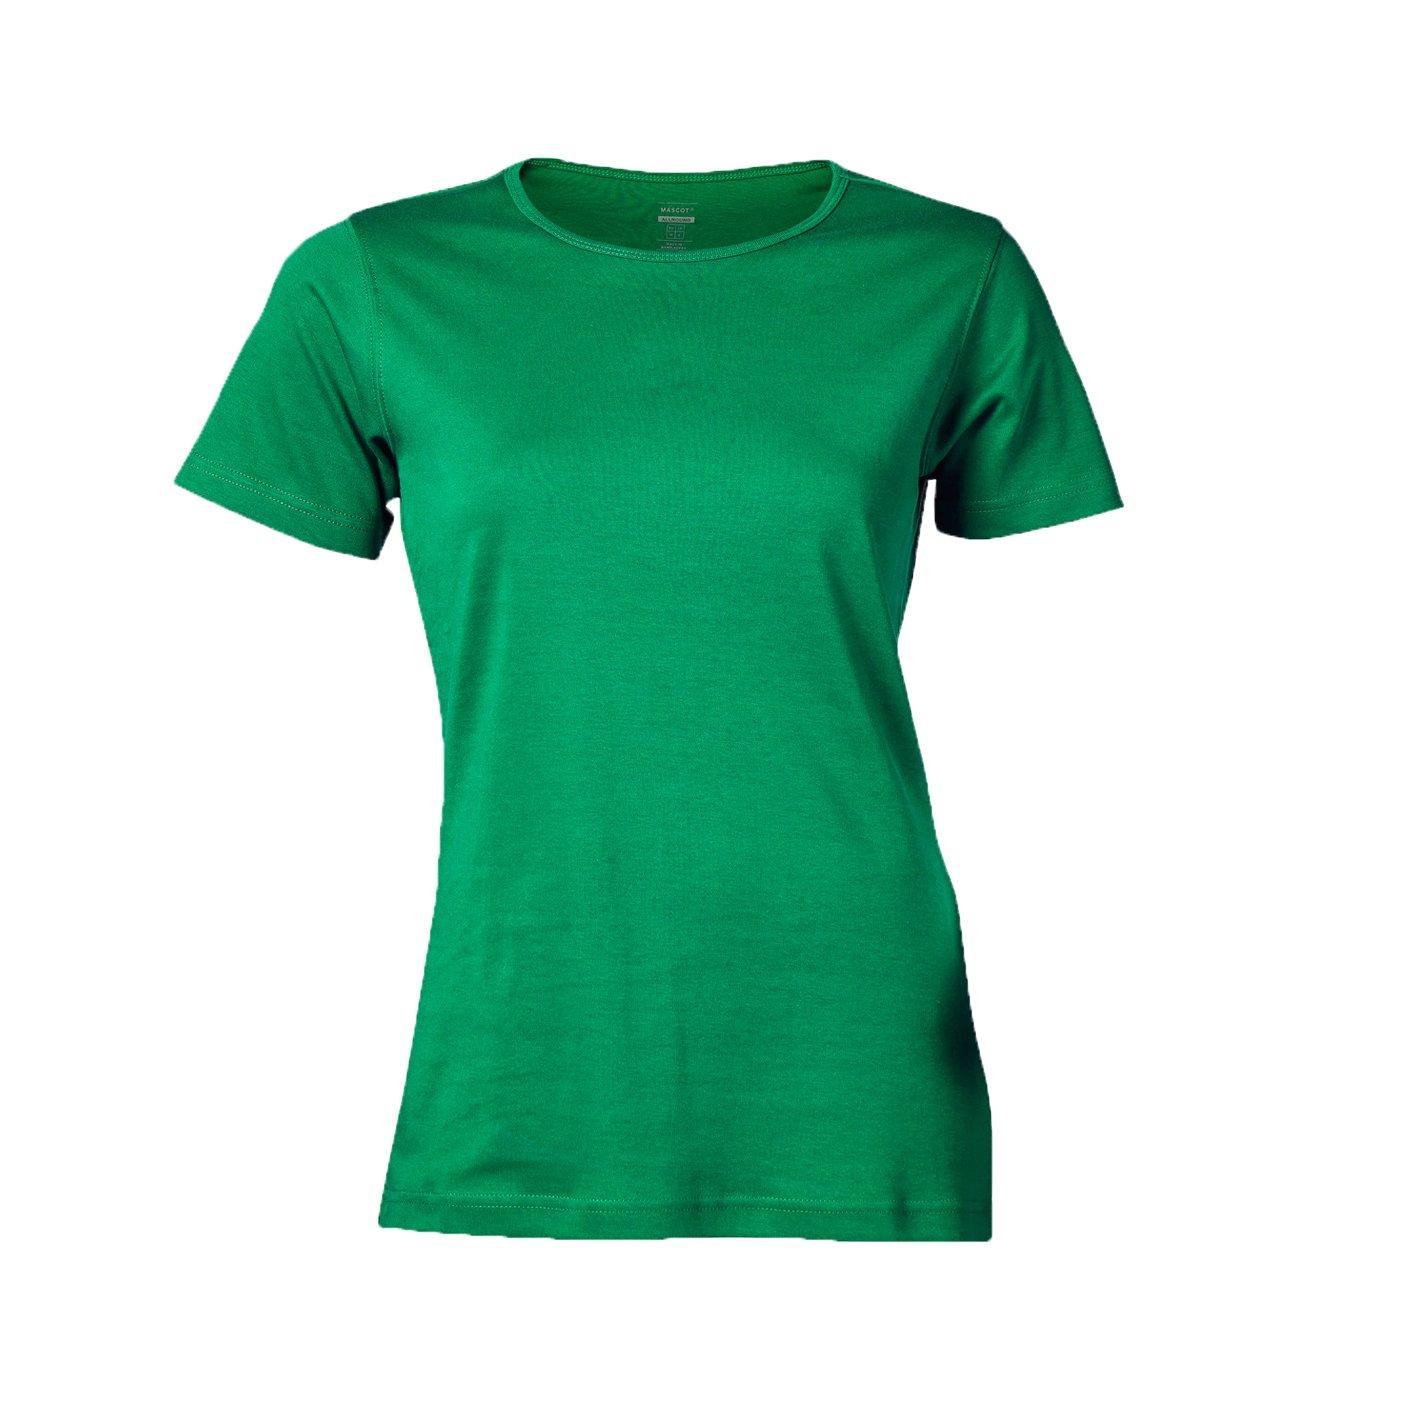 Grass Green Mascot 51583-967-333-L Woman-ShirtArras Size L